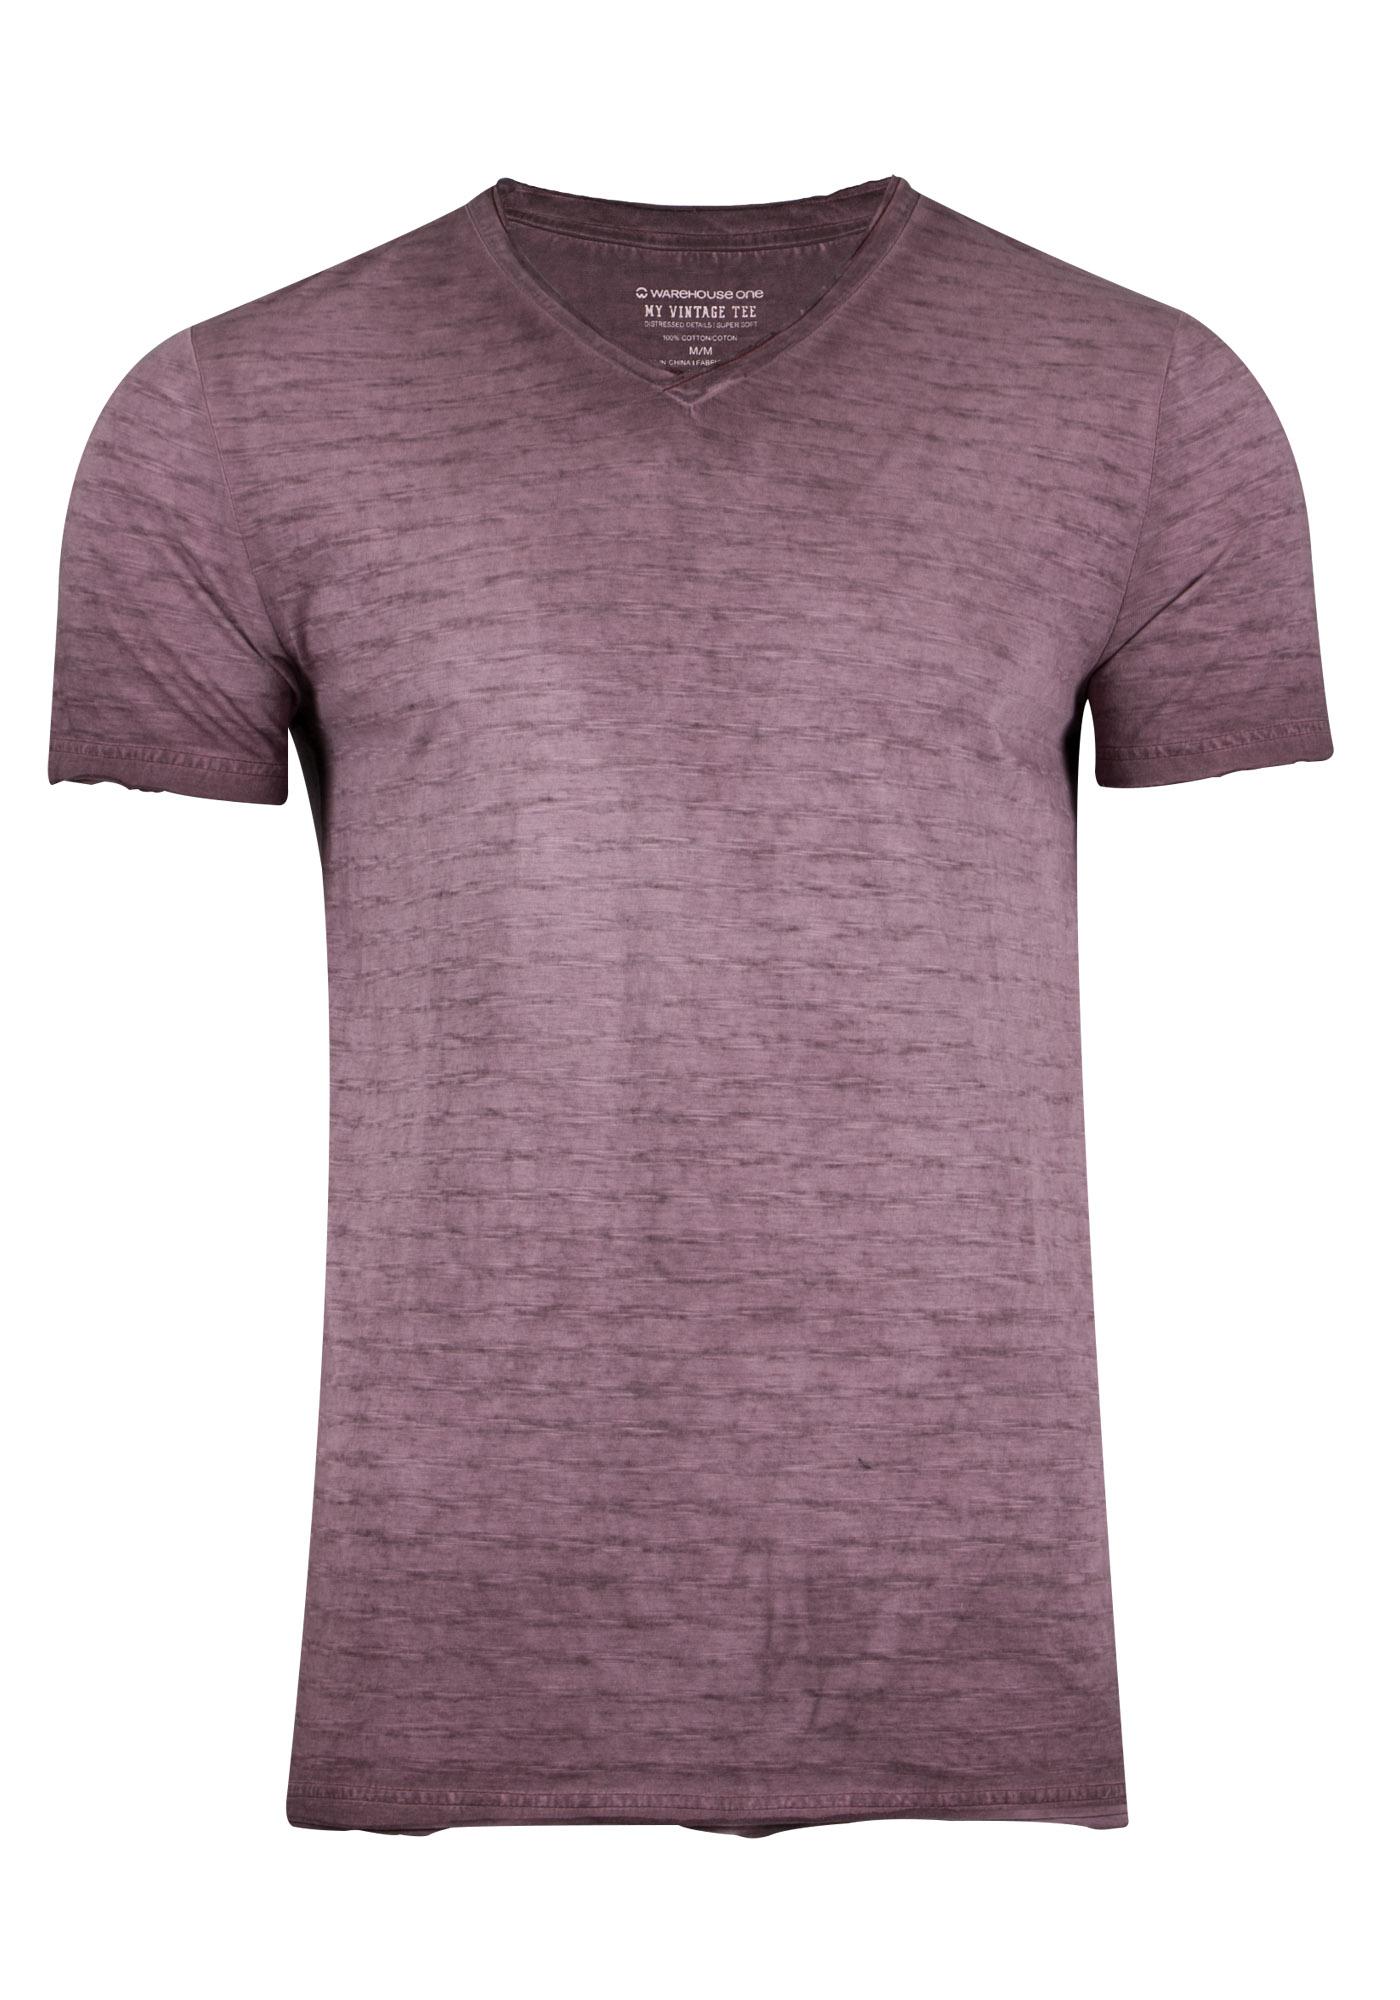 aeff5ca2338 Mens 100 Cotton V Neck T Shirts - BCD Tofu House